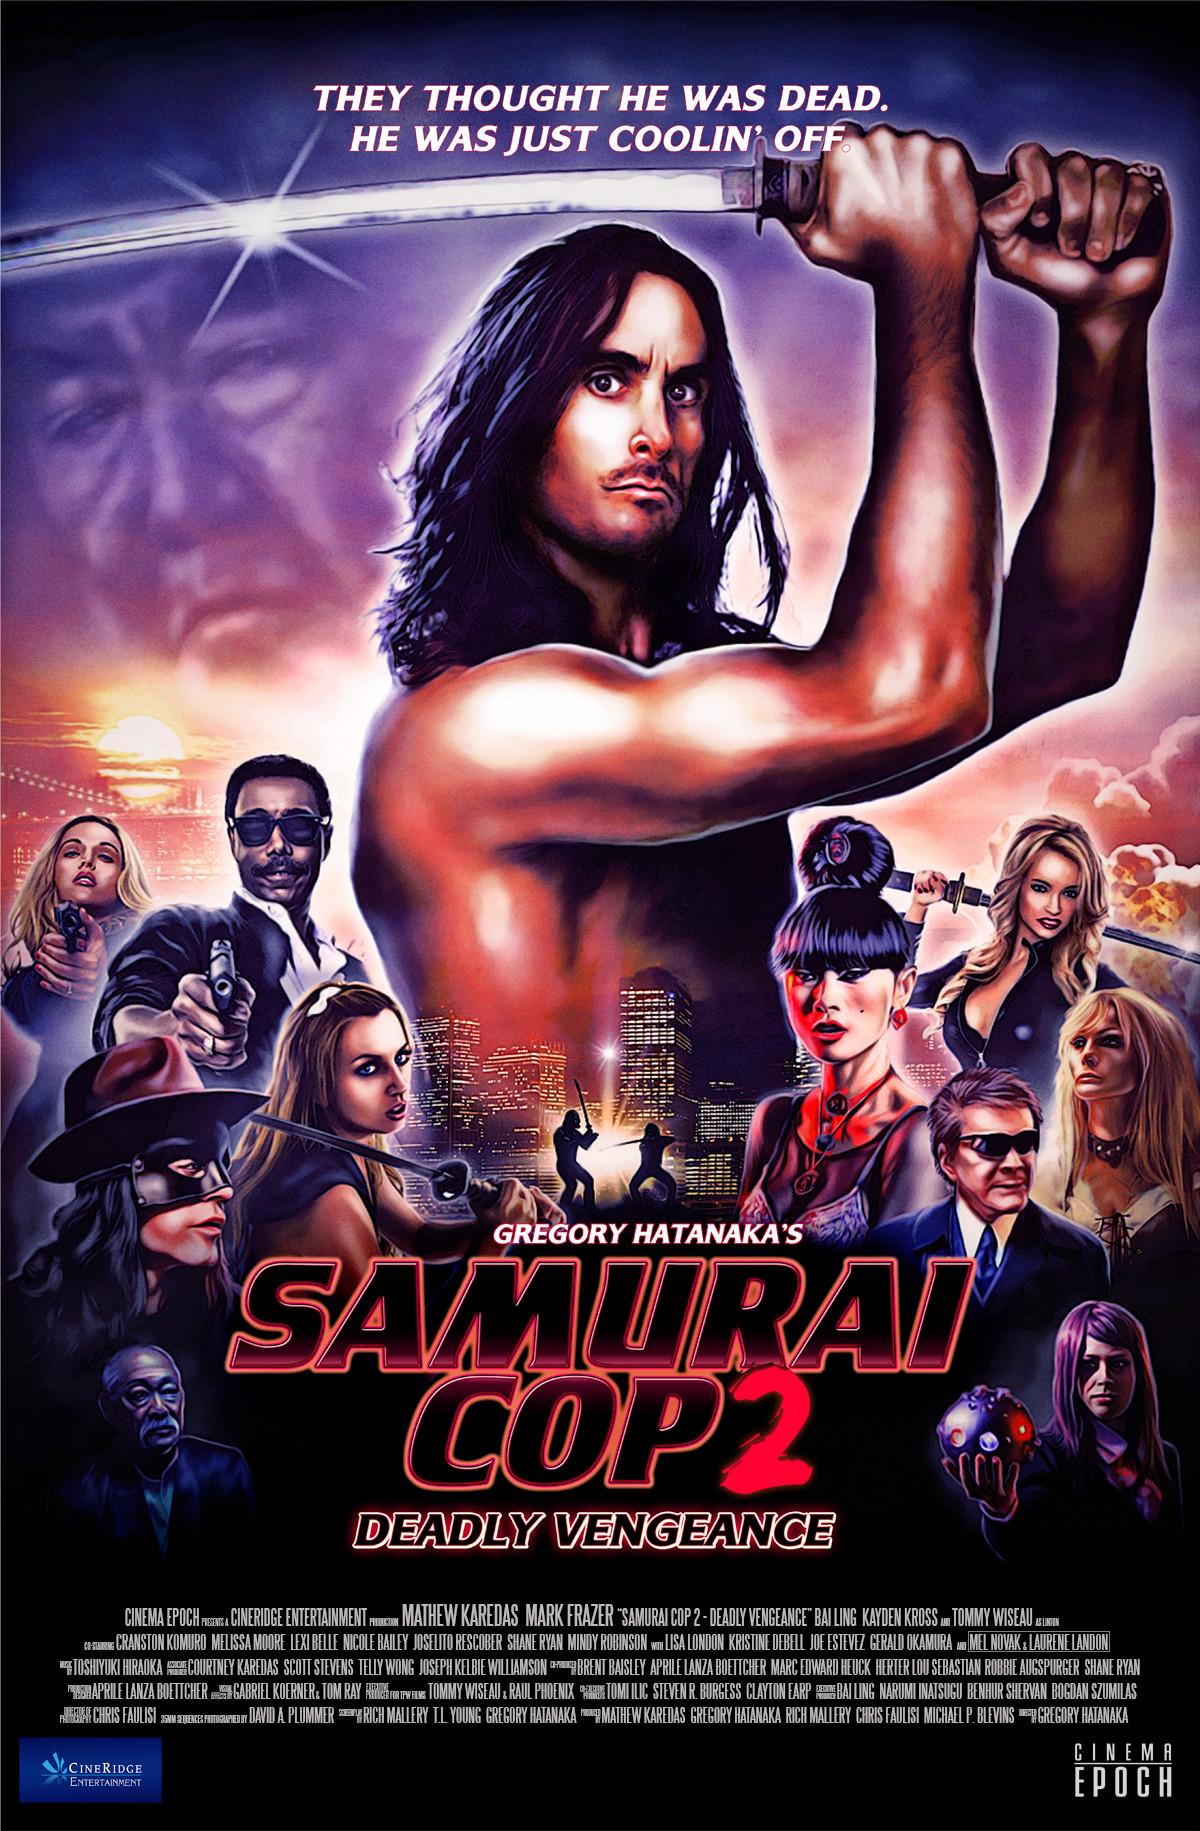 Official Samurai Cop 2 Deadly Vengeance Trailer Offers